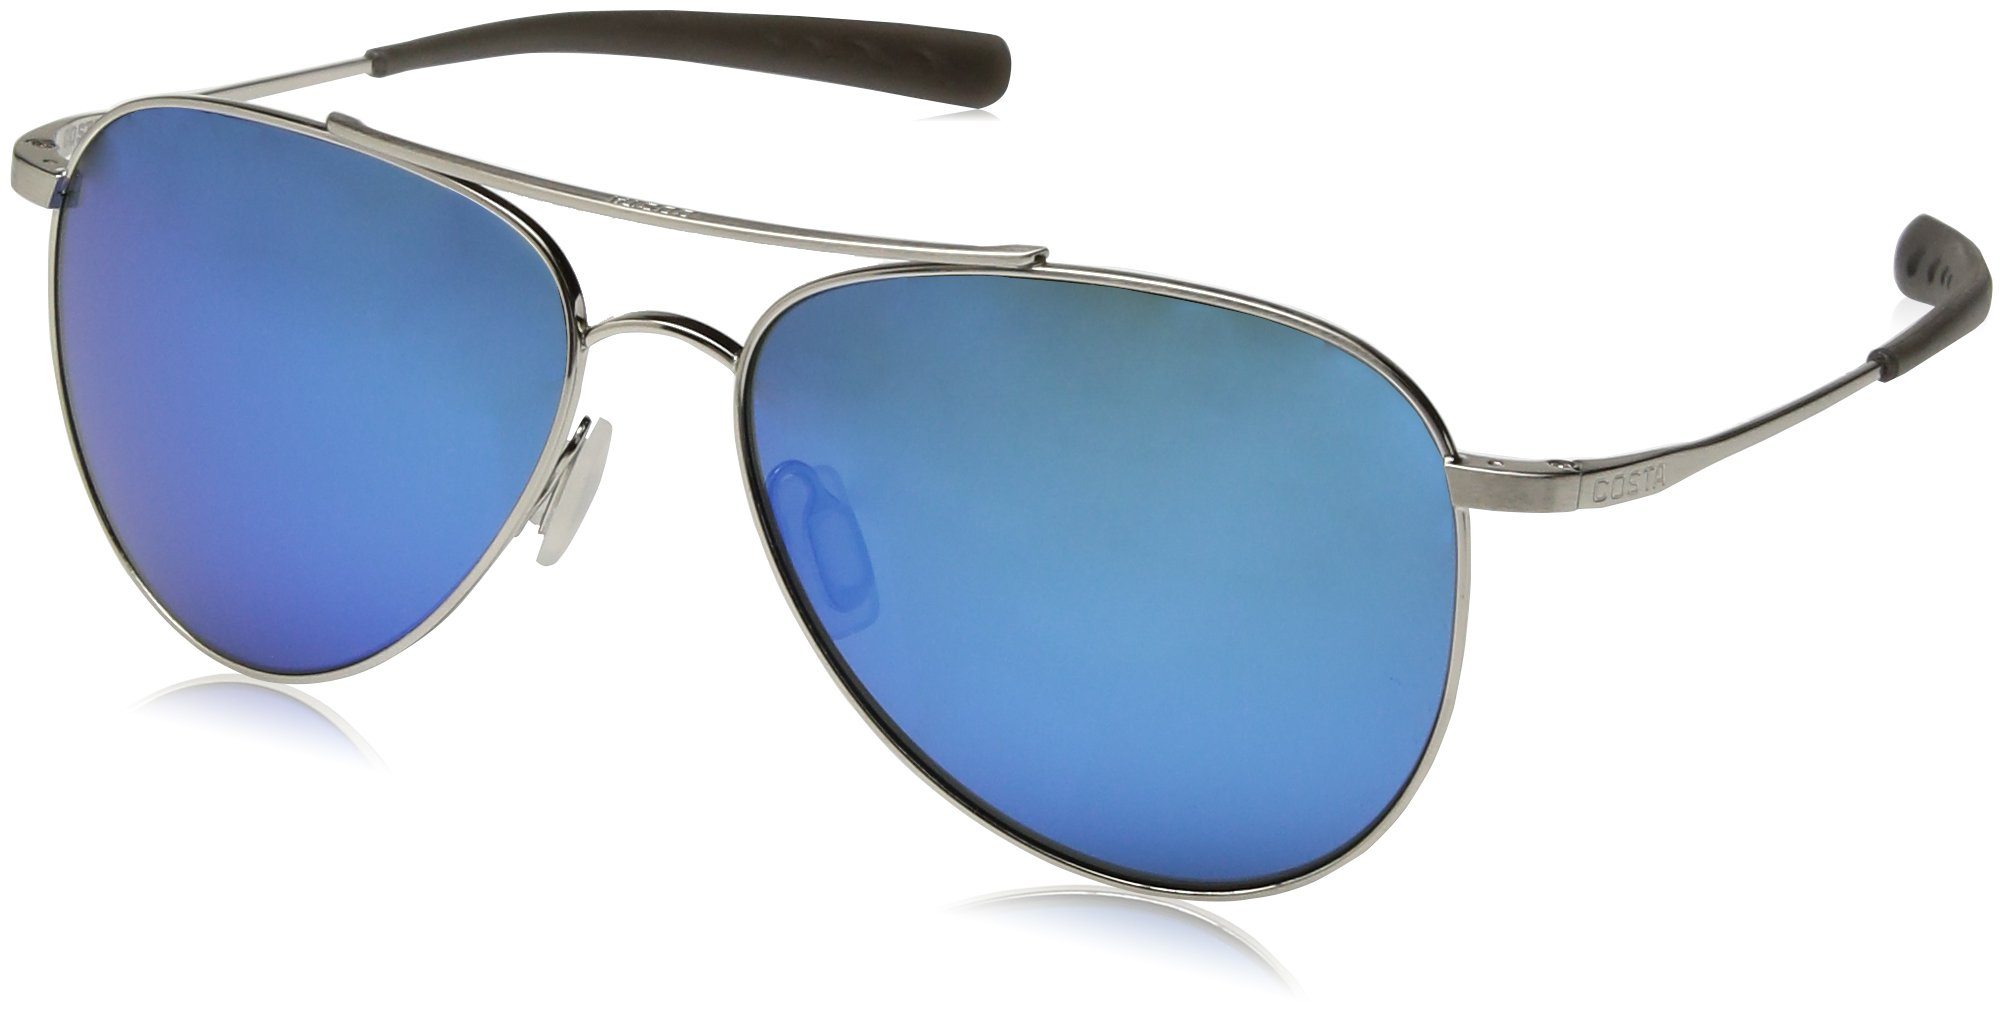 Costa del Mar Cook Polarized Iridium Aviator Sunglasses, Brushed Palladium, 59.7 mm by Costa Del Mar (Image #1)